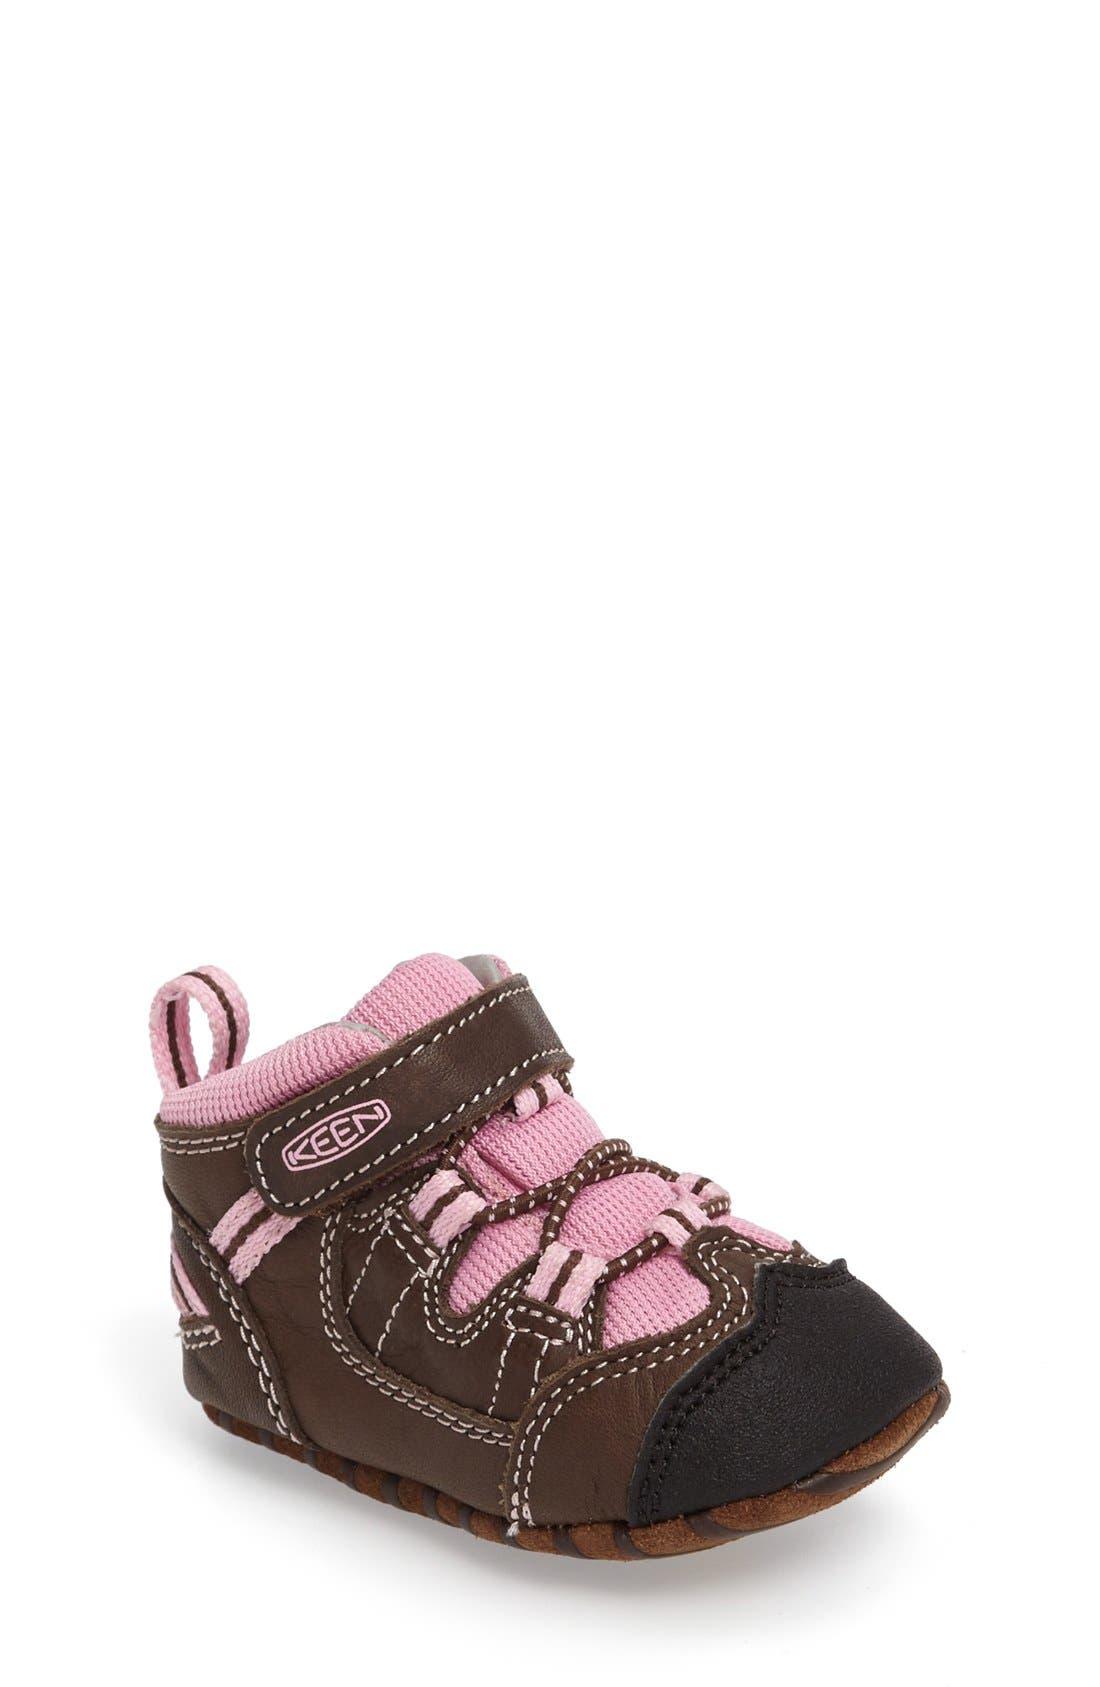 KEEN Targhee Crib Shoe